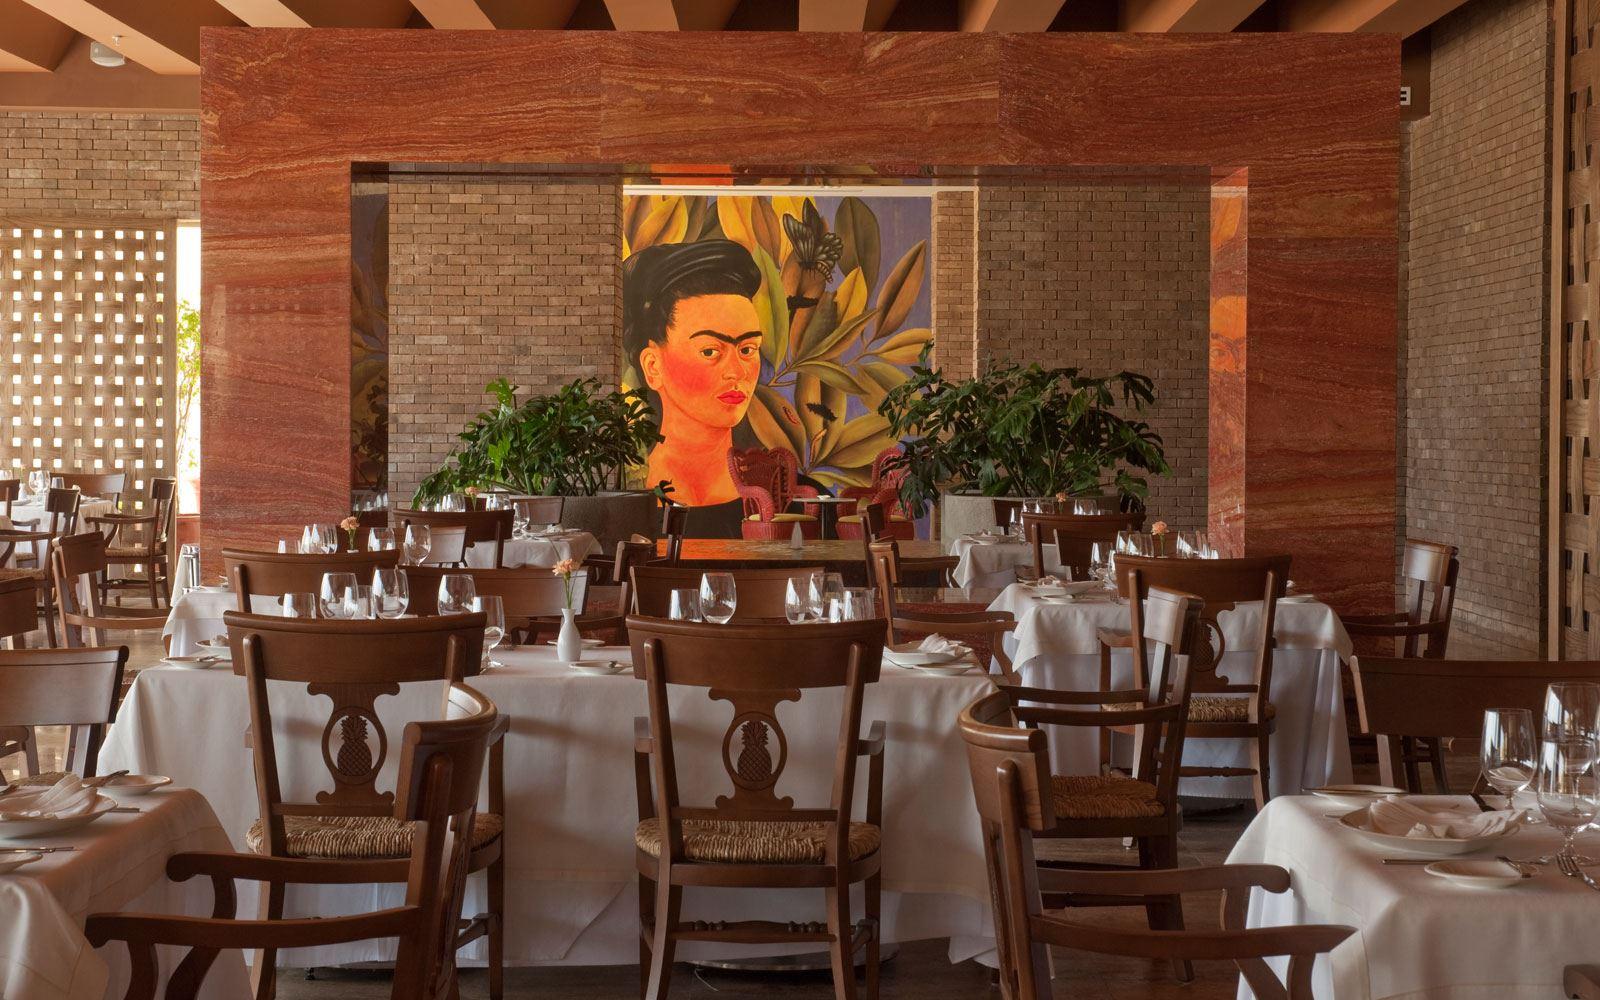 Panama dining room